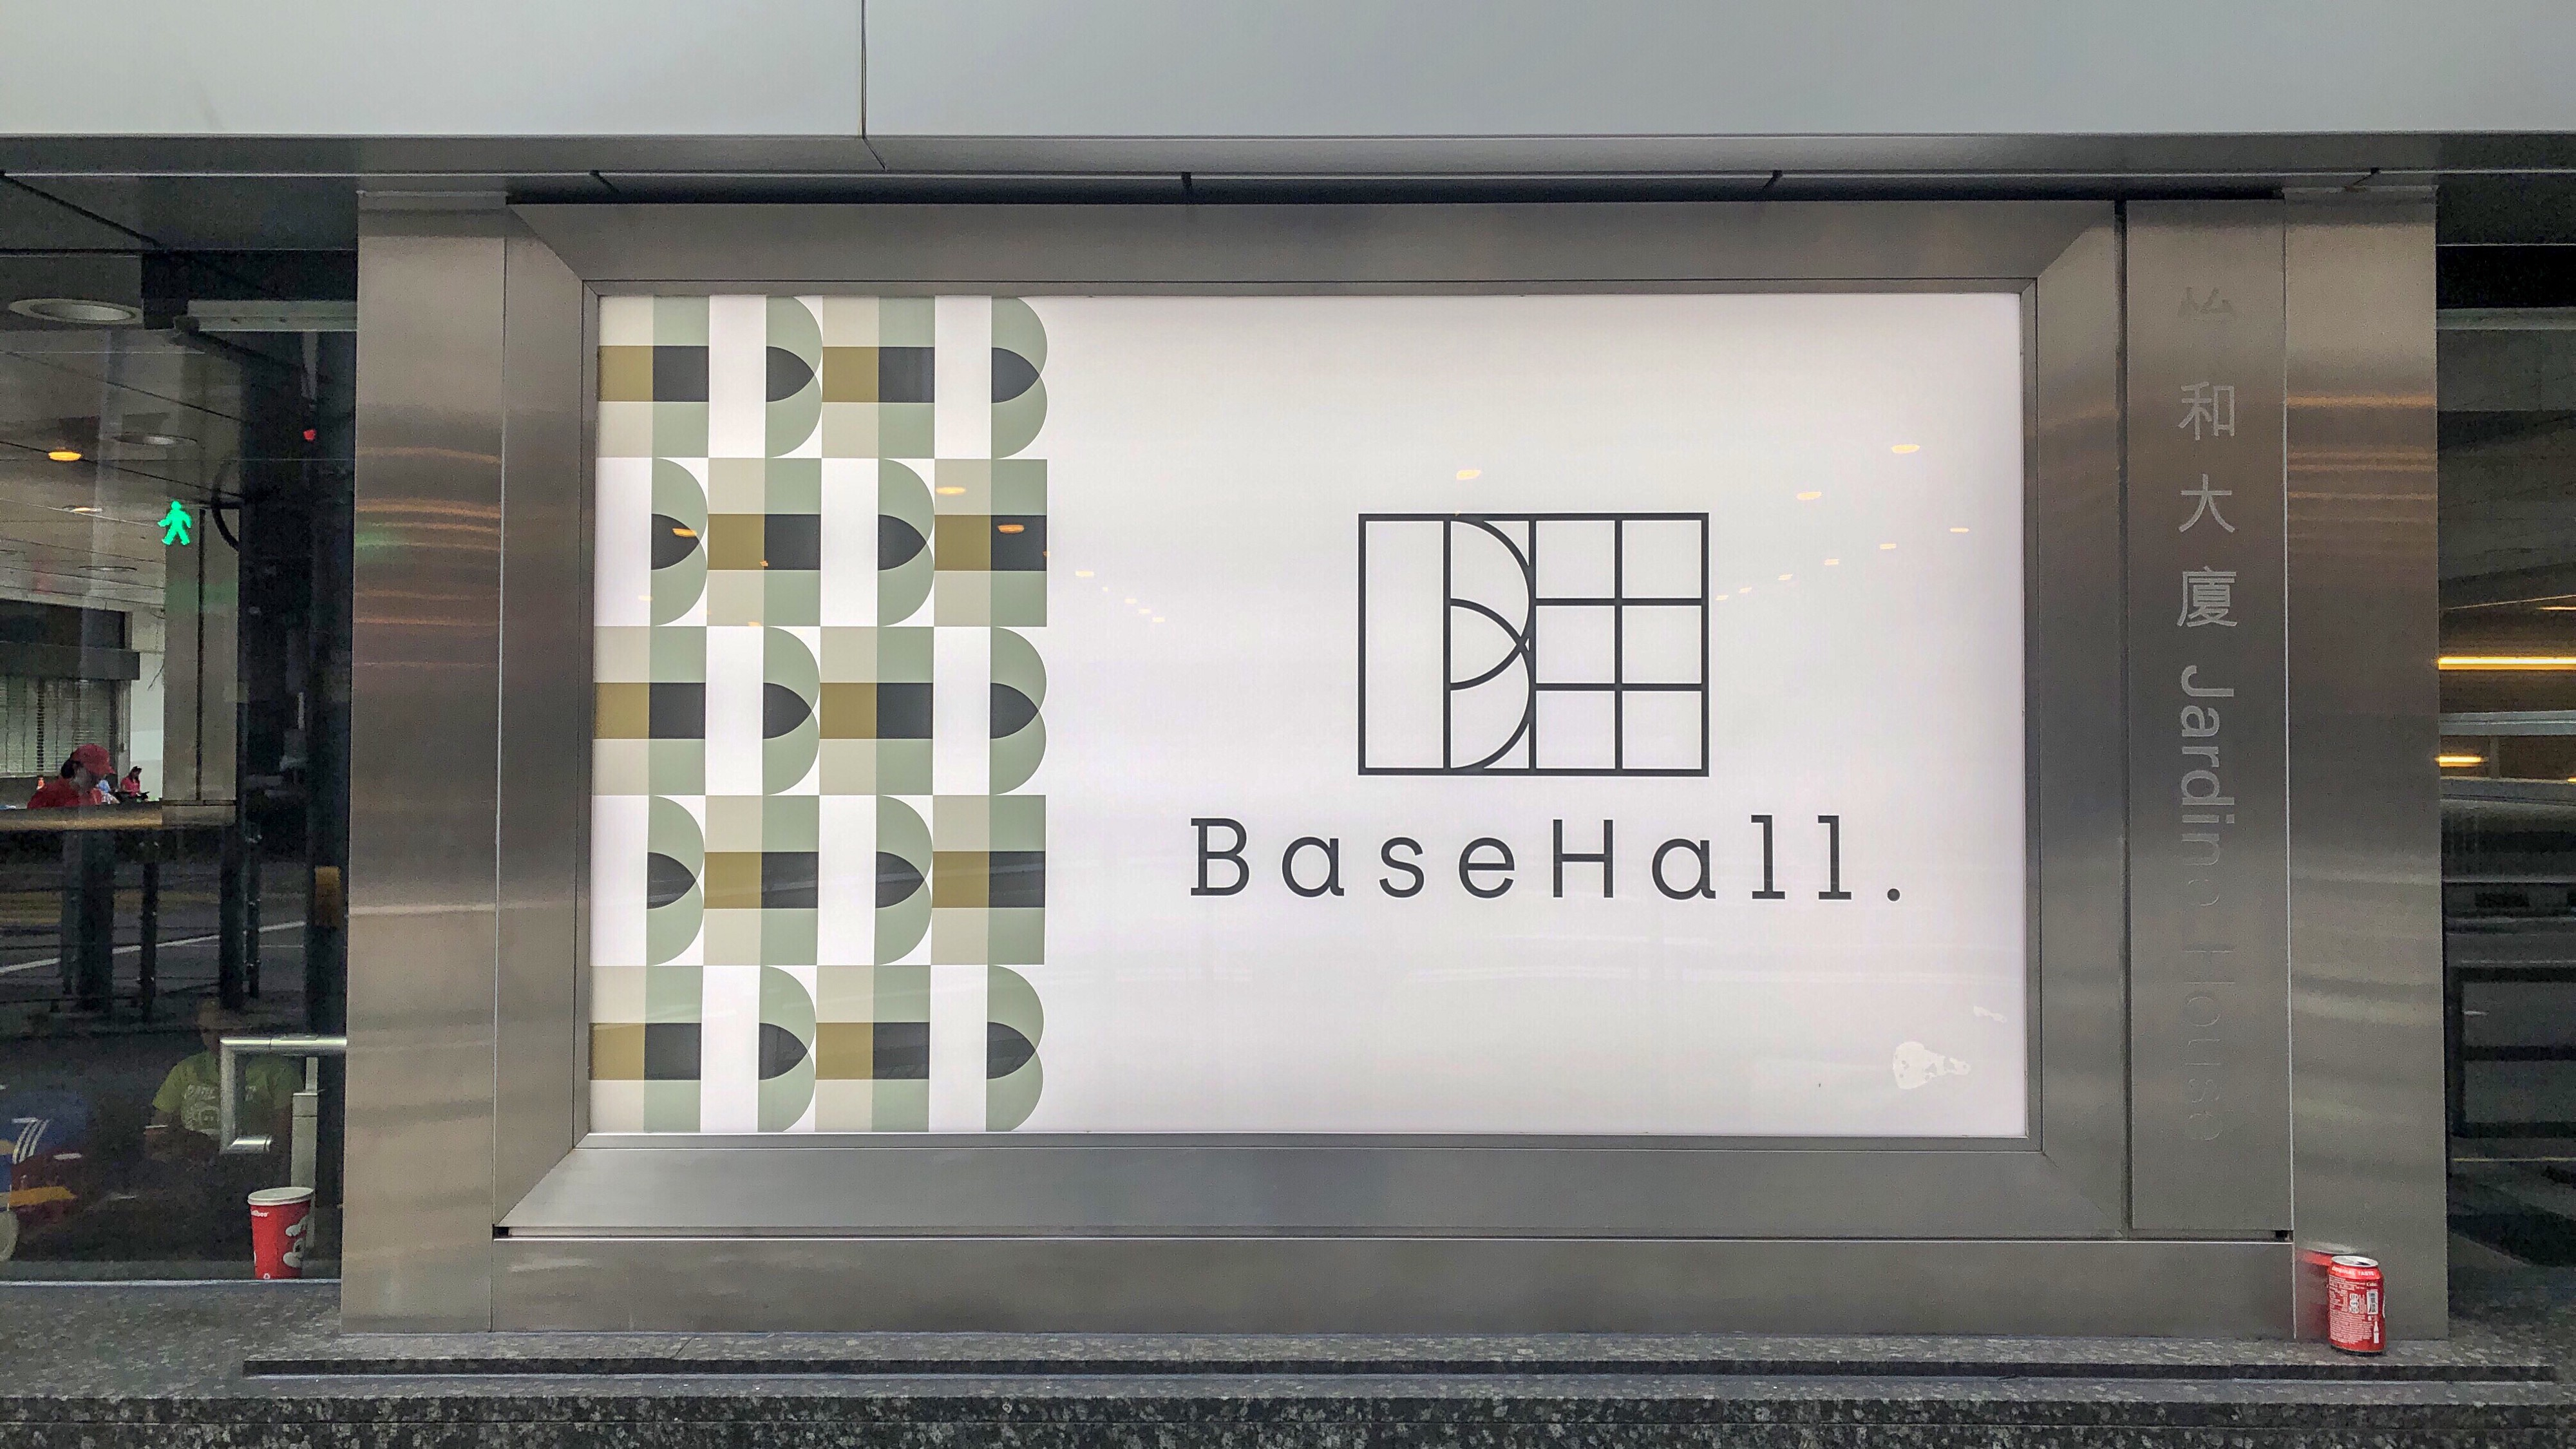 假日打烊的英式food court 中環怡和大廈 Basehall   by hkmalls   港mall專題   Jul, 2020   Medium